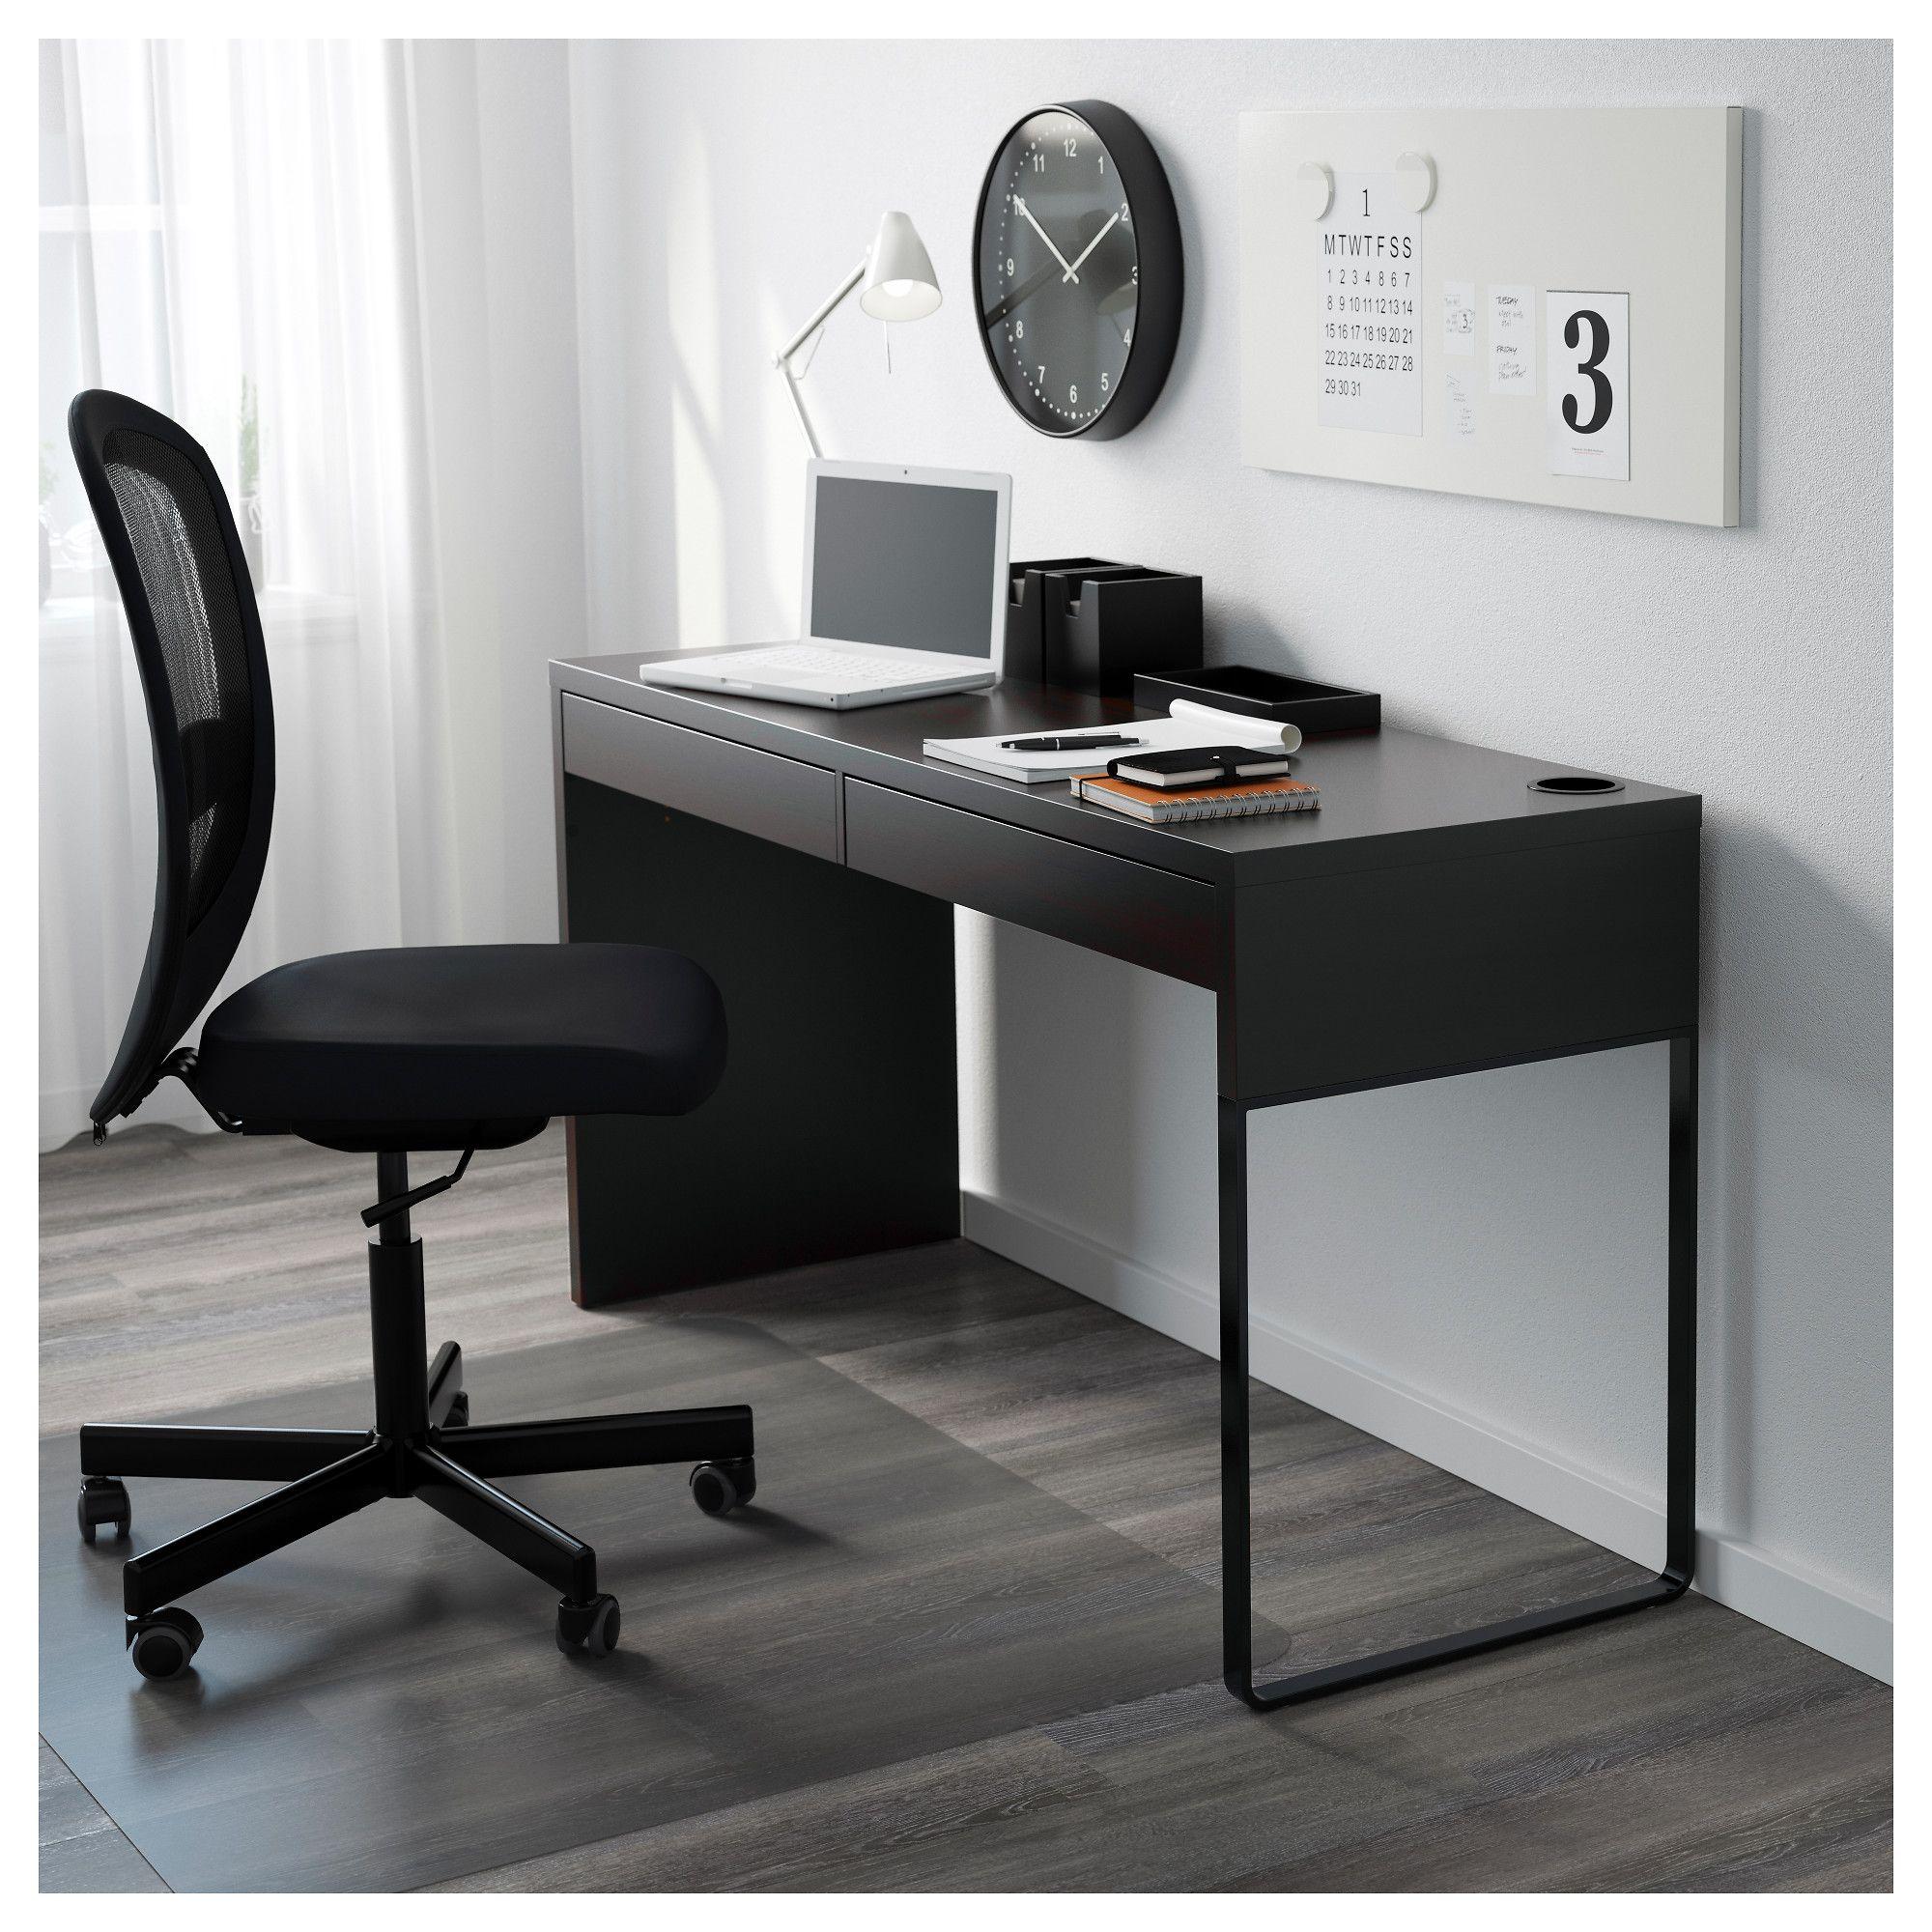 IKEA MICKE Desk blackbrown Micke desk, Ikea small